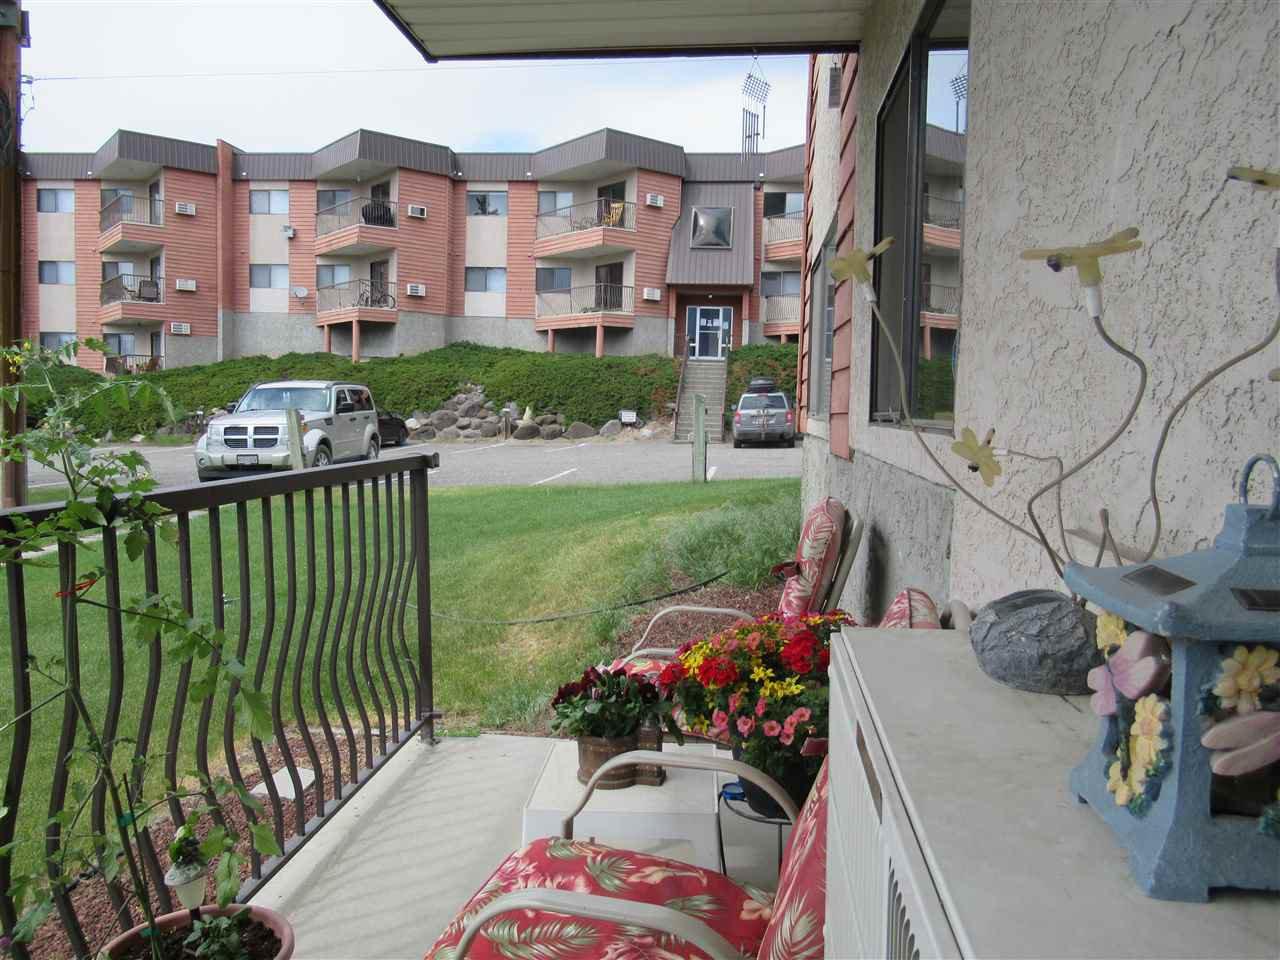 Photo 14: Photos: 101 280 N BROADWAY Avenue in Williams Lake: Williams Lake - City Condo for sale (Williams Lake (Zone 27))  : MLS®# R2382503